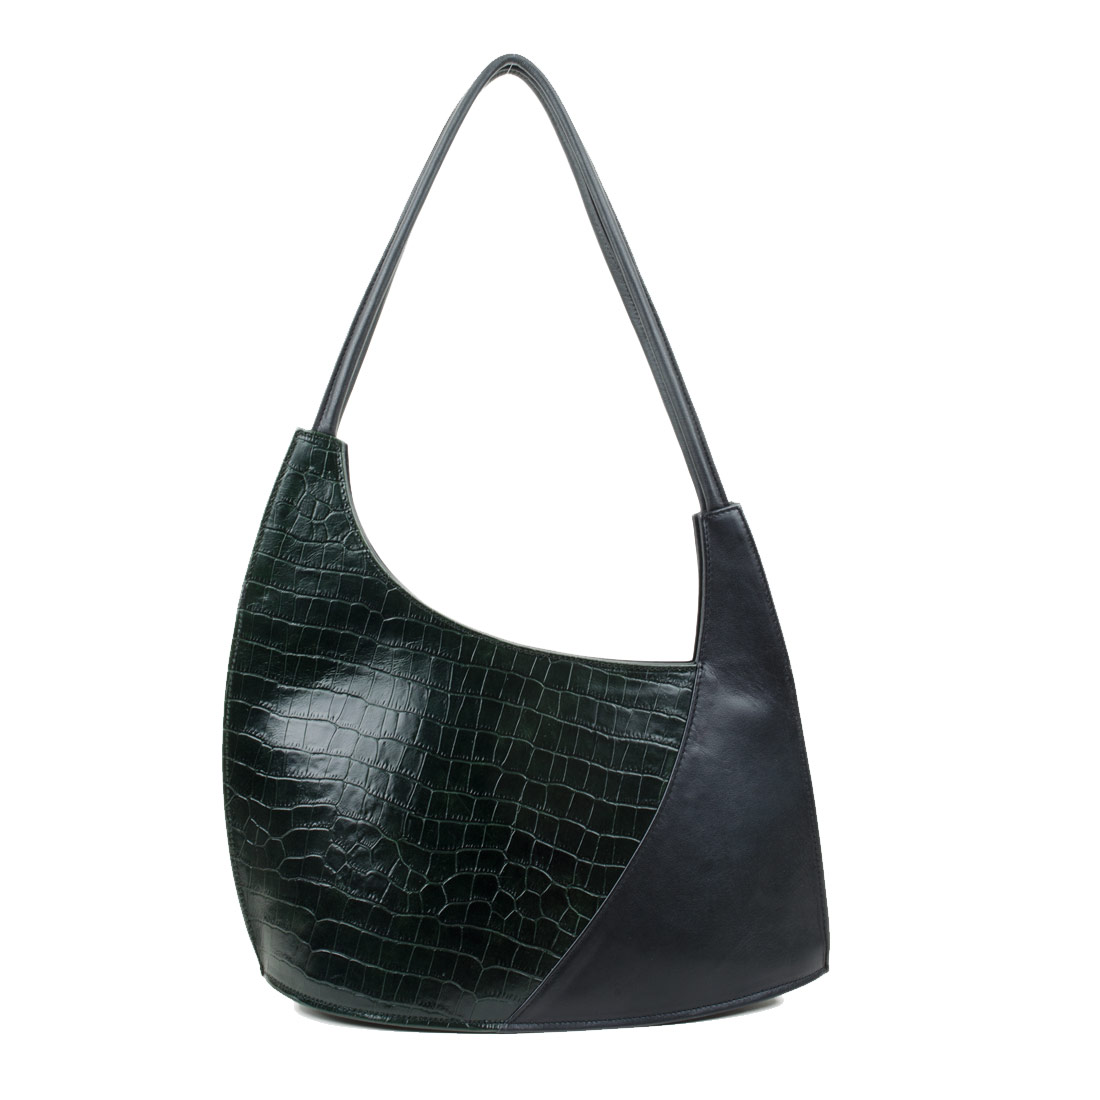 Scoop Green Crocodile Print Leather Shoulder Bag